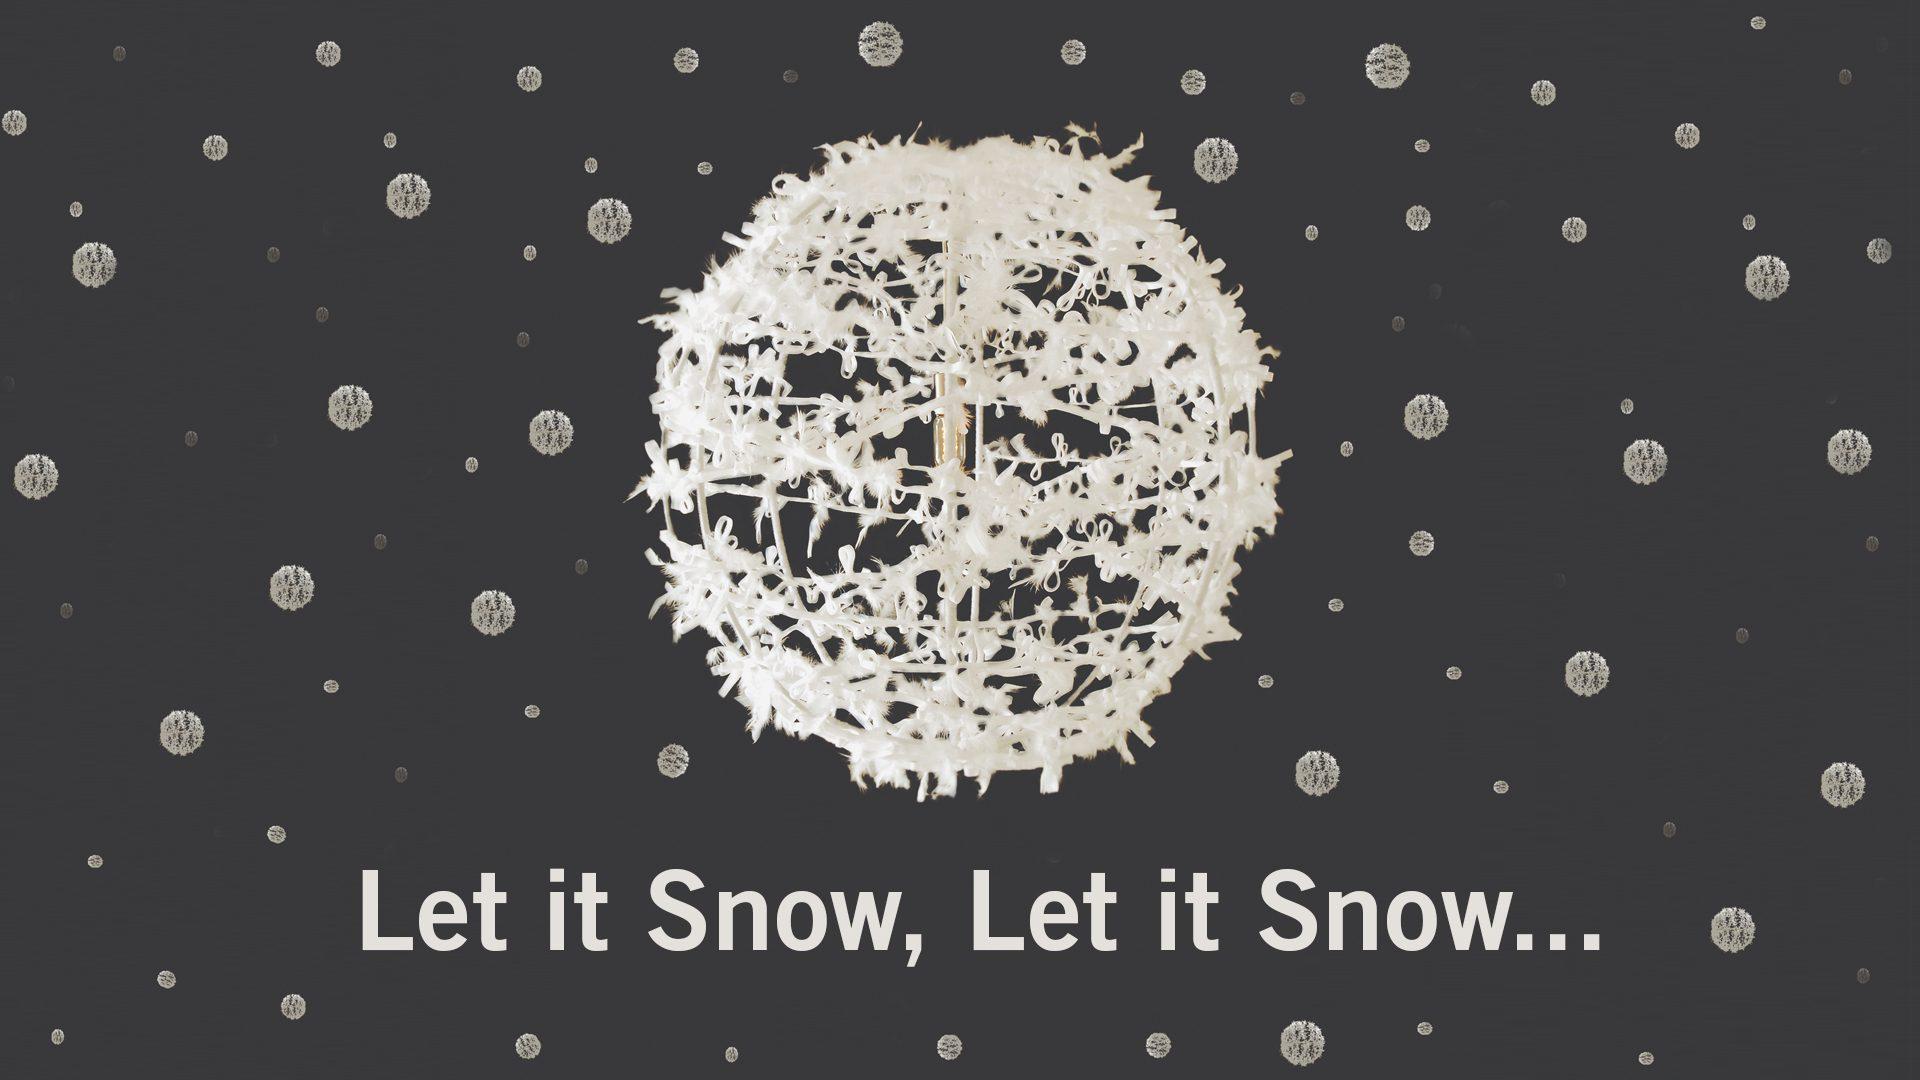 Let it Snow Lighting Sculpture